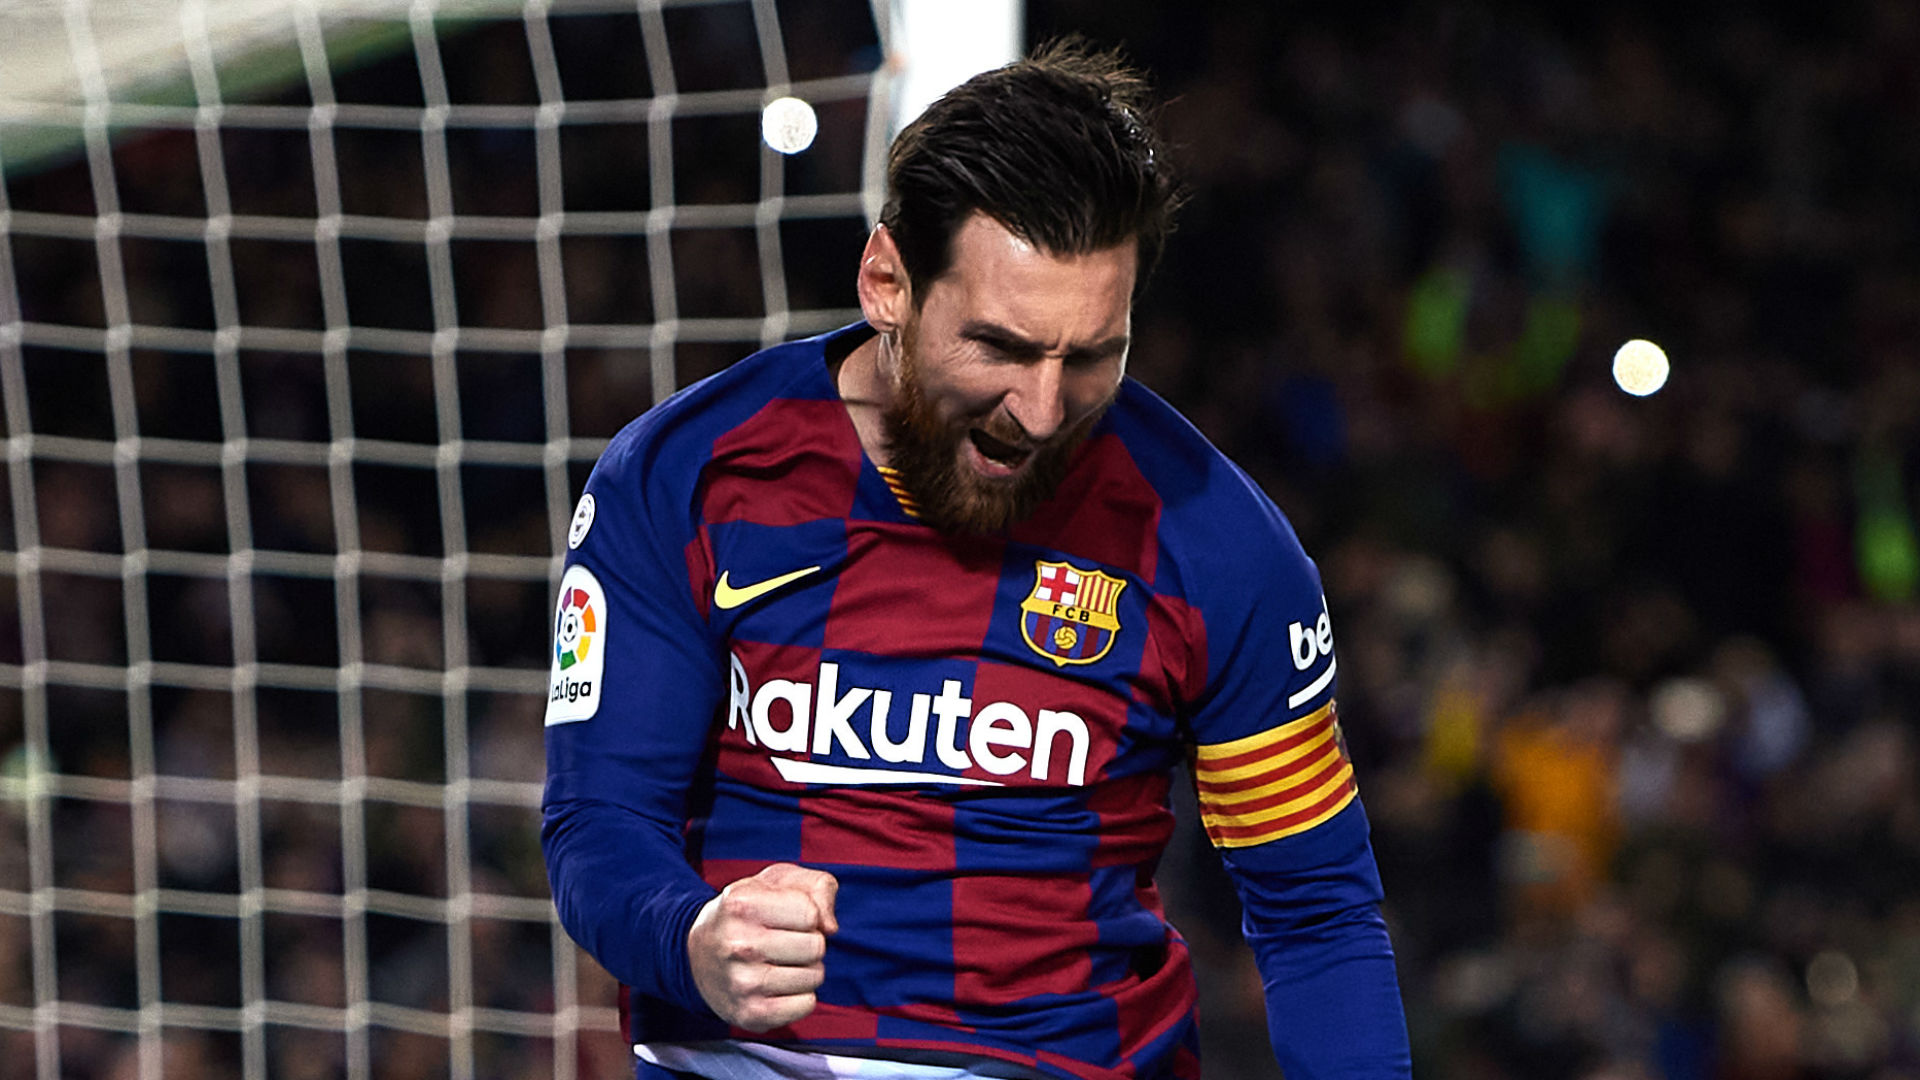 Coronavirus: Messi's enthusiasm contagious for Barcelona squad – Alba